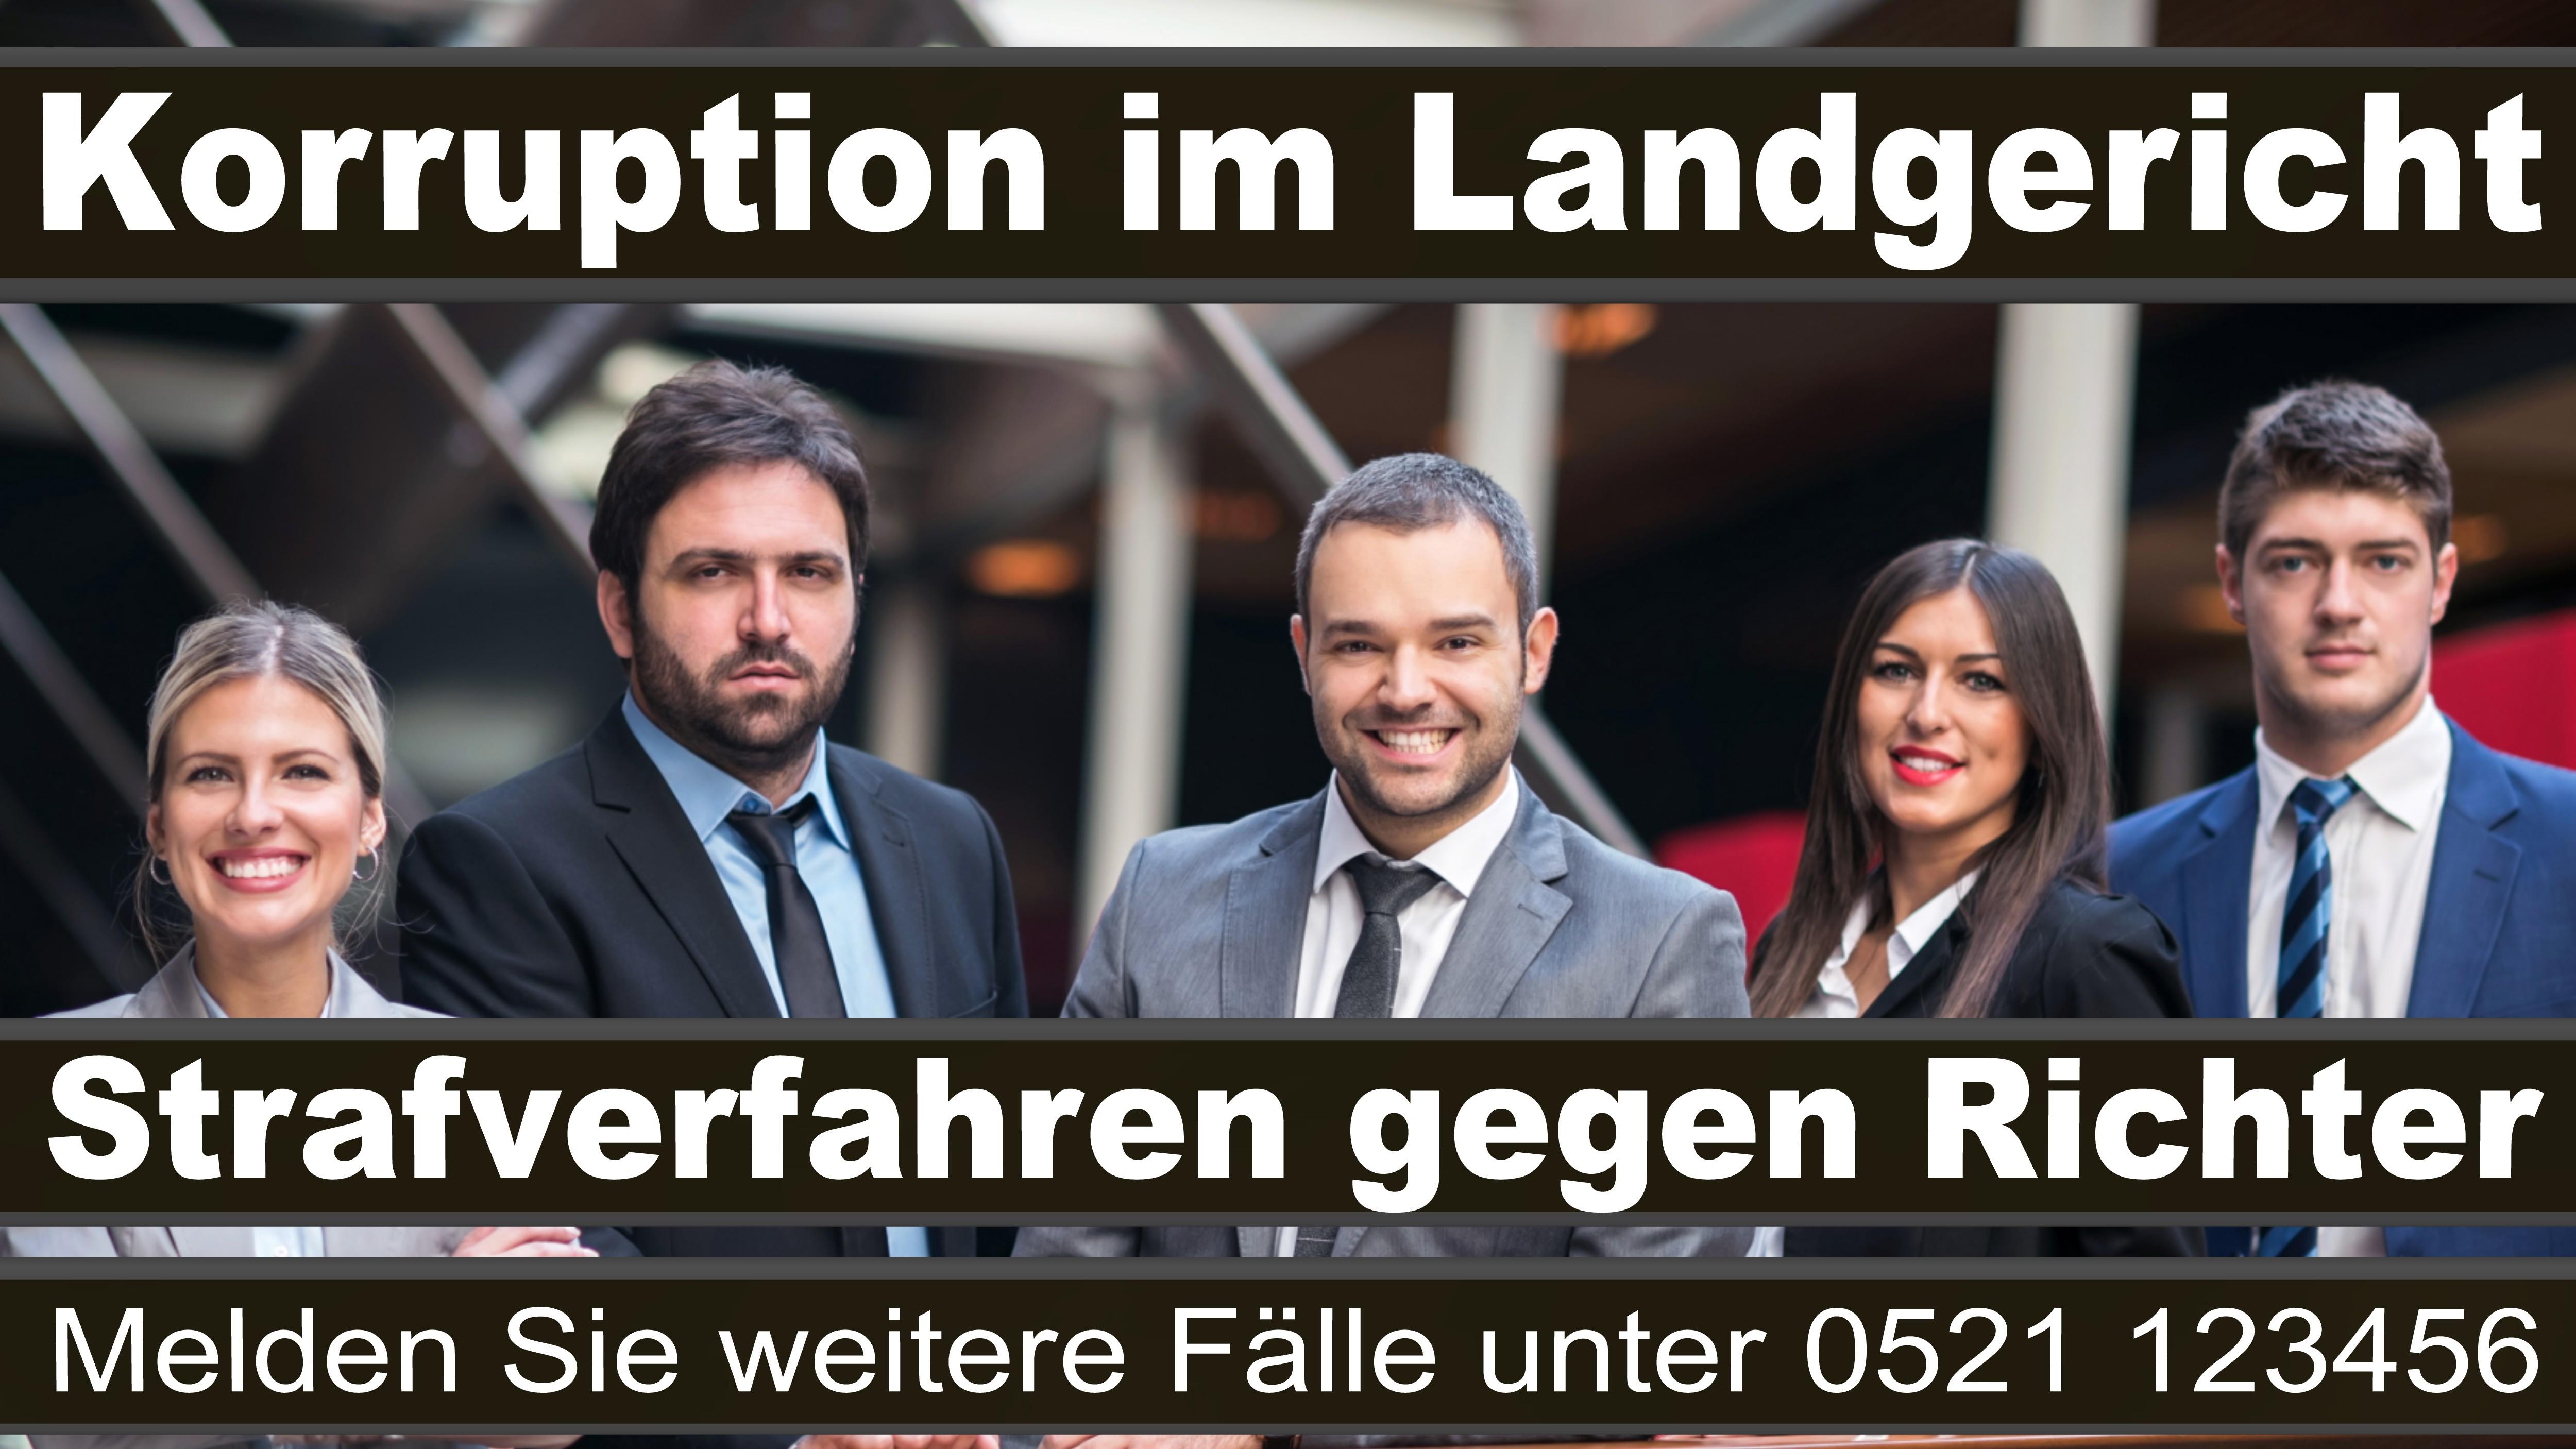 Korruption, Rechtsbeugung, Parteiverrat, Rechtsanwalt, Justiz, Präsident, Direktor, Leitender Oberstaatsanwalt, Landesarbeitsgericht Berlin Brandenburg